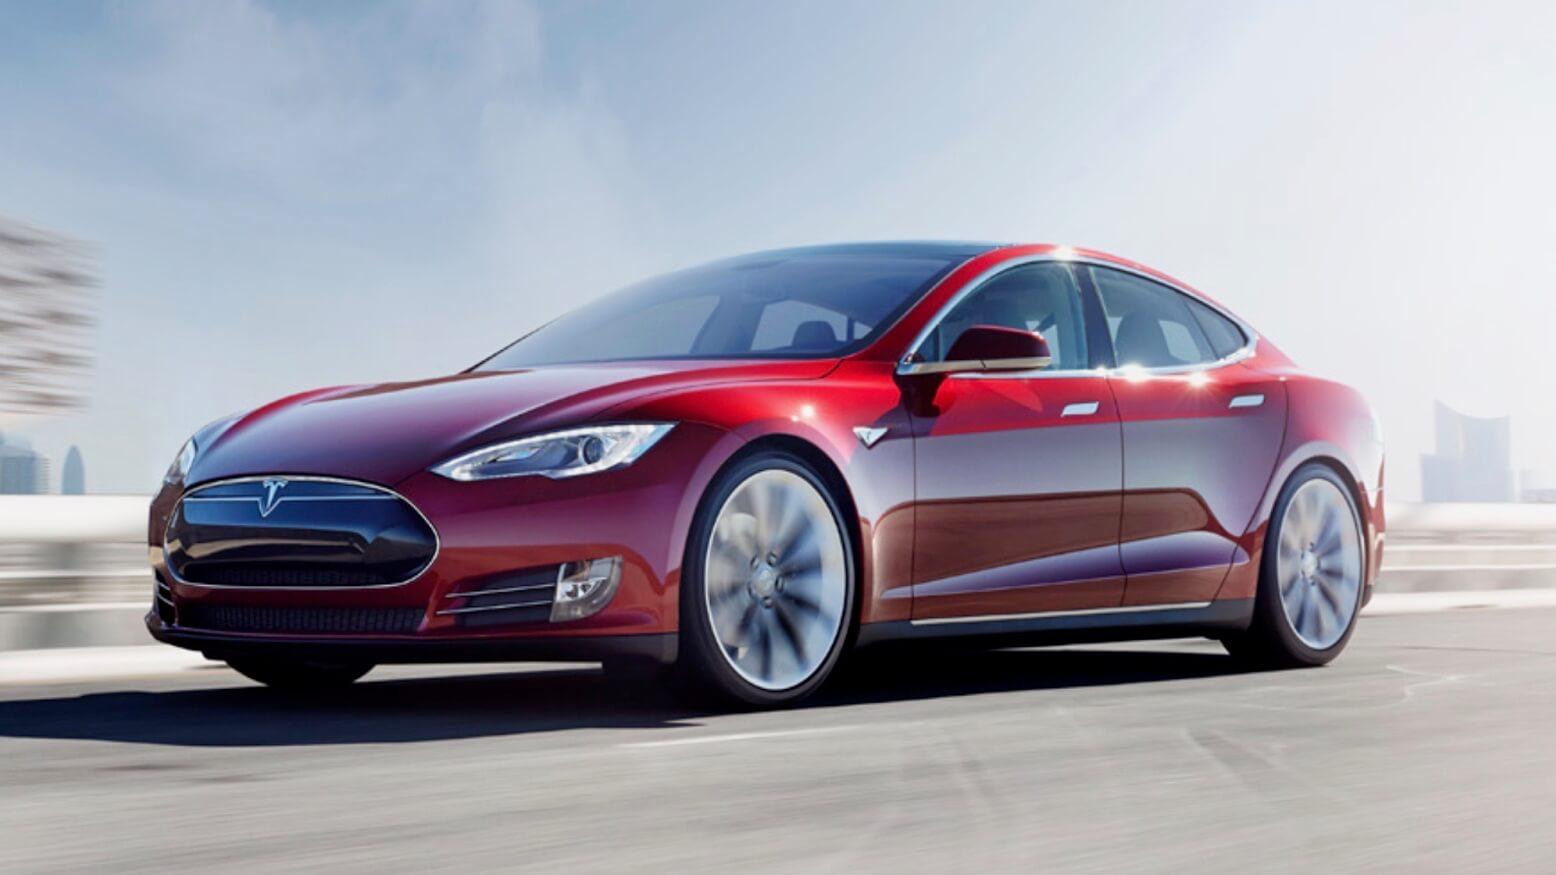 Tesla Model S pre facelift